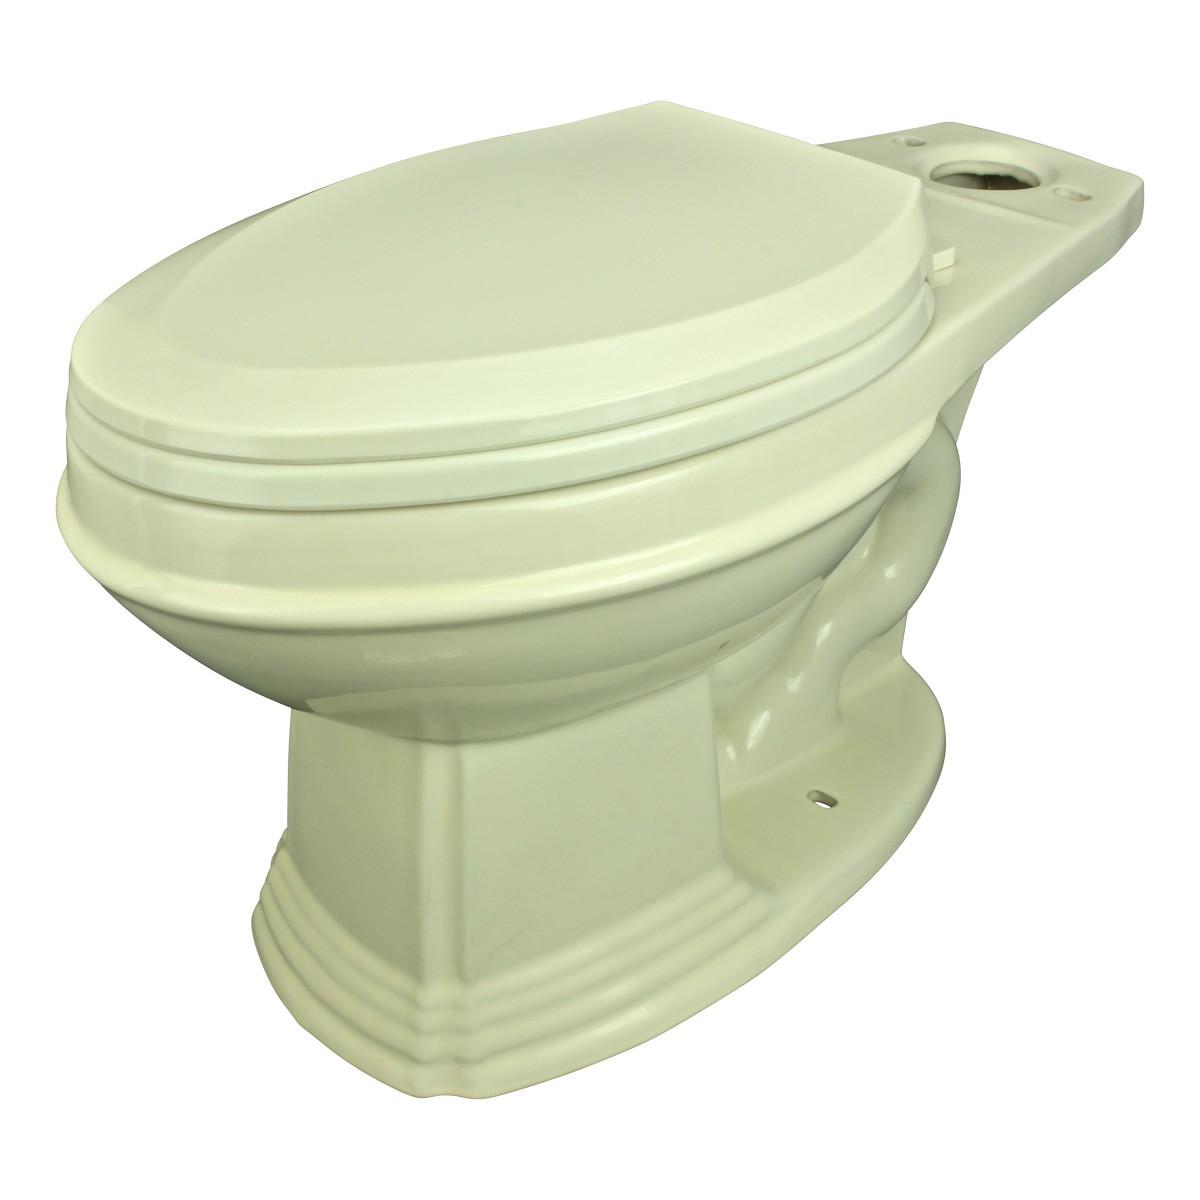 Cool Toilet Part Bone Sheffield 19 Elongate Toilet Bowl Only Beatyapartments Chair Design Images Beatyapartmentscom